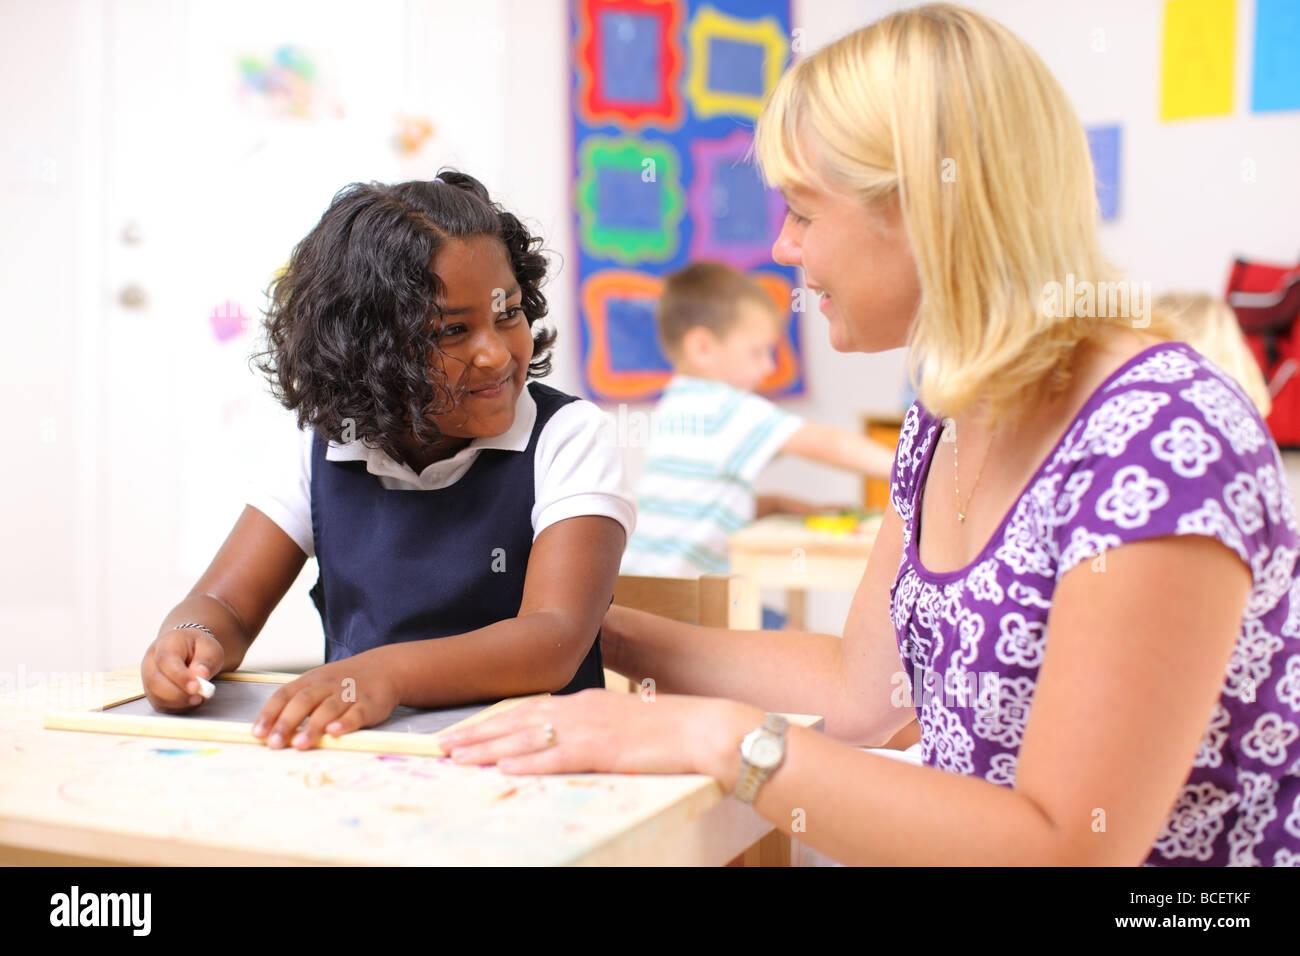 Teacher working with preschool girl - Stock Image